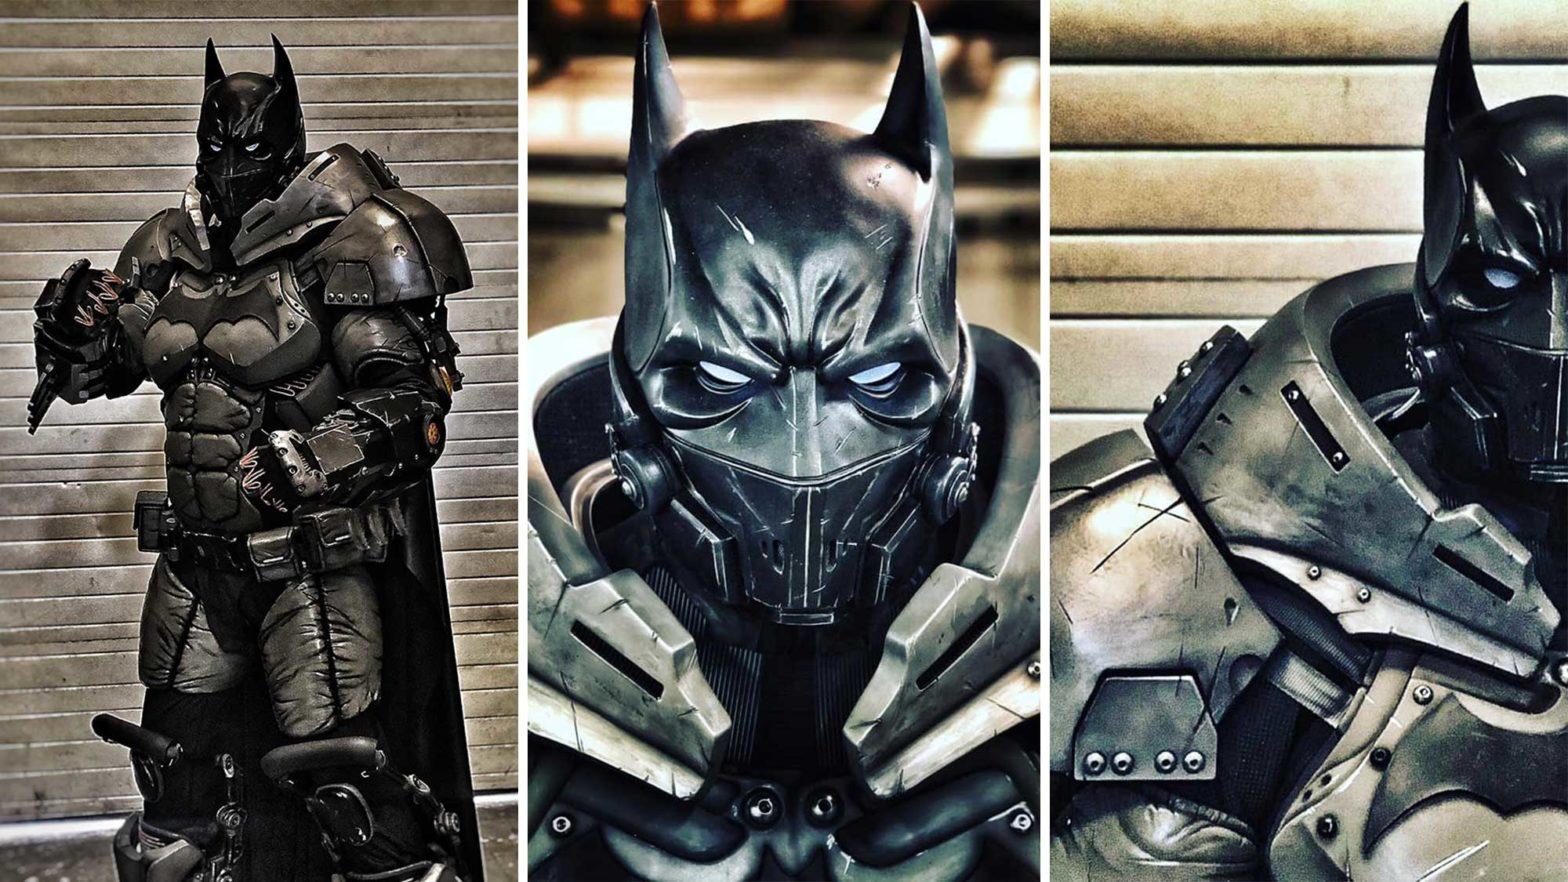 Batman XE Suit by Julian Checkley